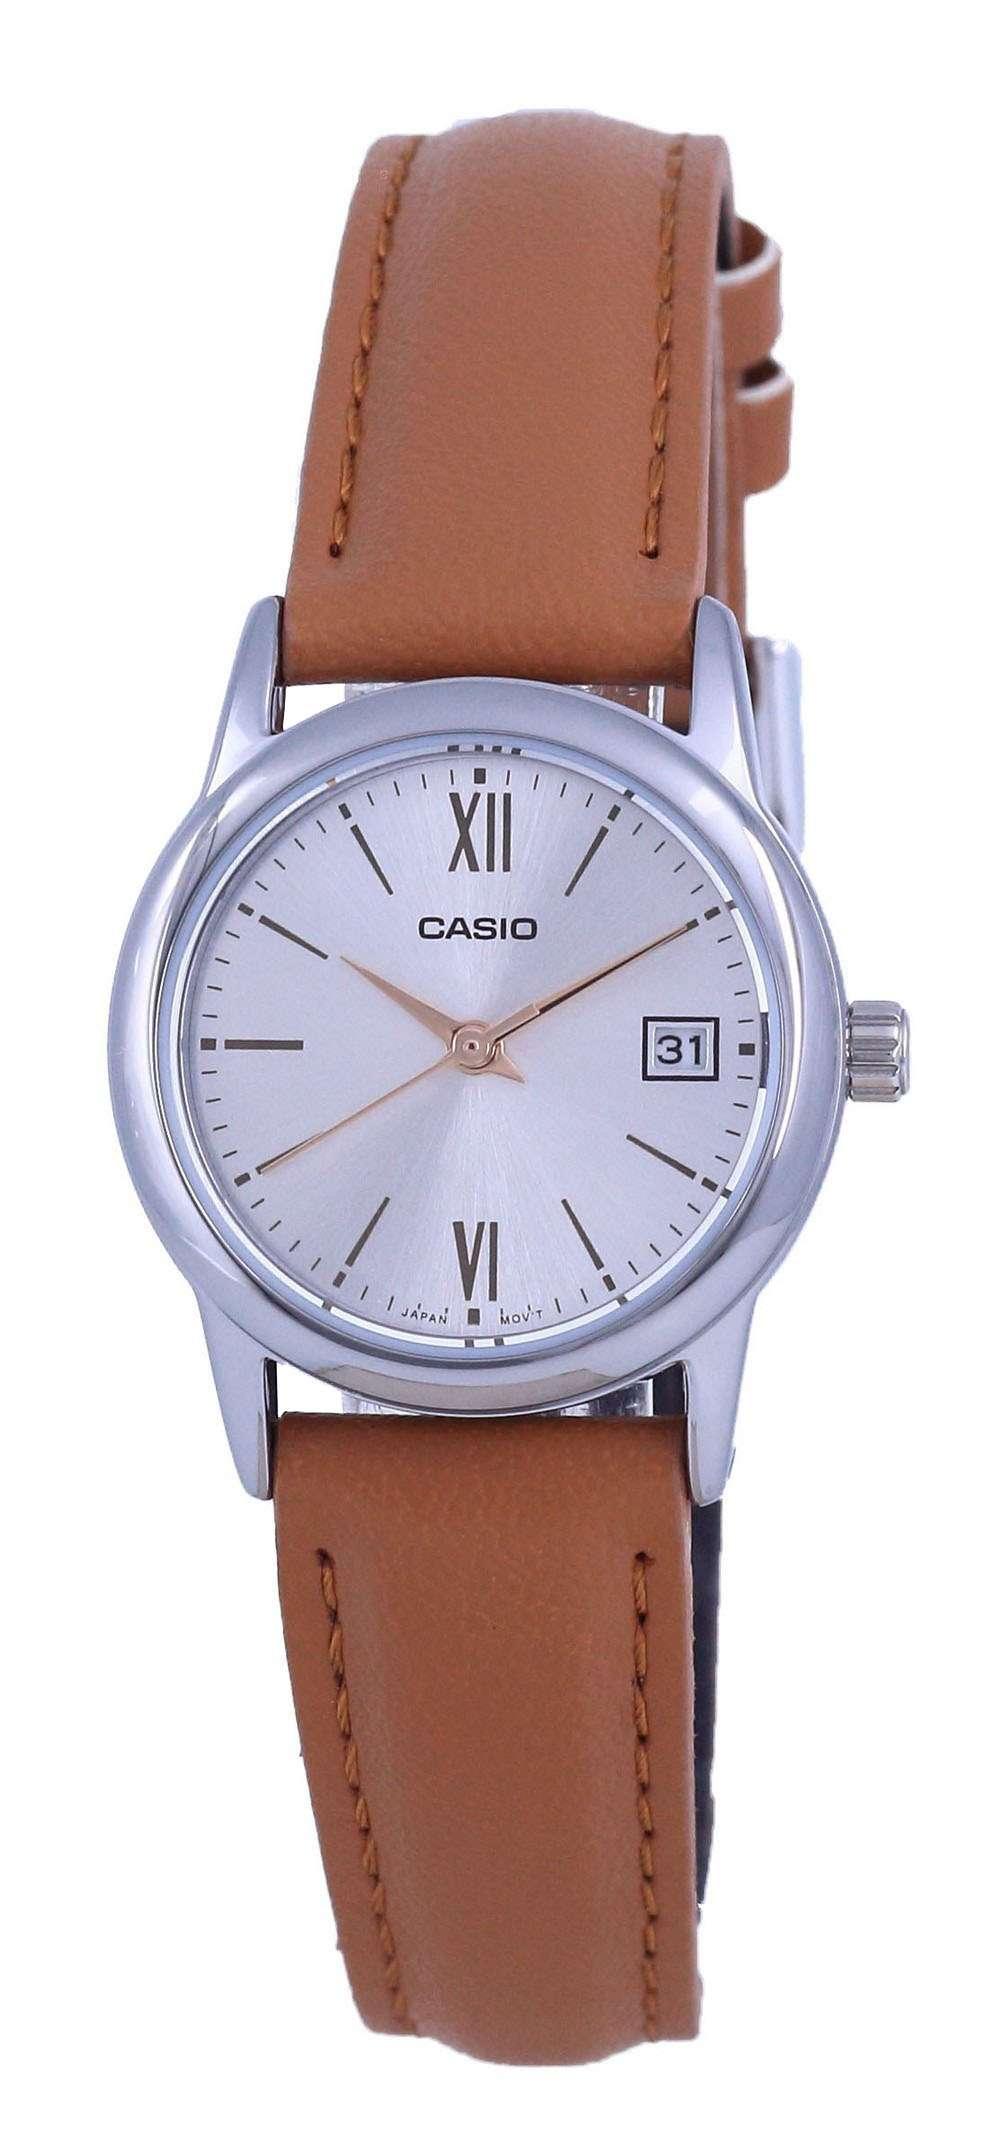 Reloj Casio de cuarzo analógico de acero inoxidable con esfera plateada LTP-V002L-7B3 LTPV002L-7 para mujer